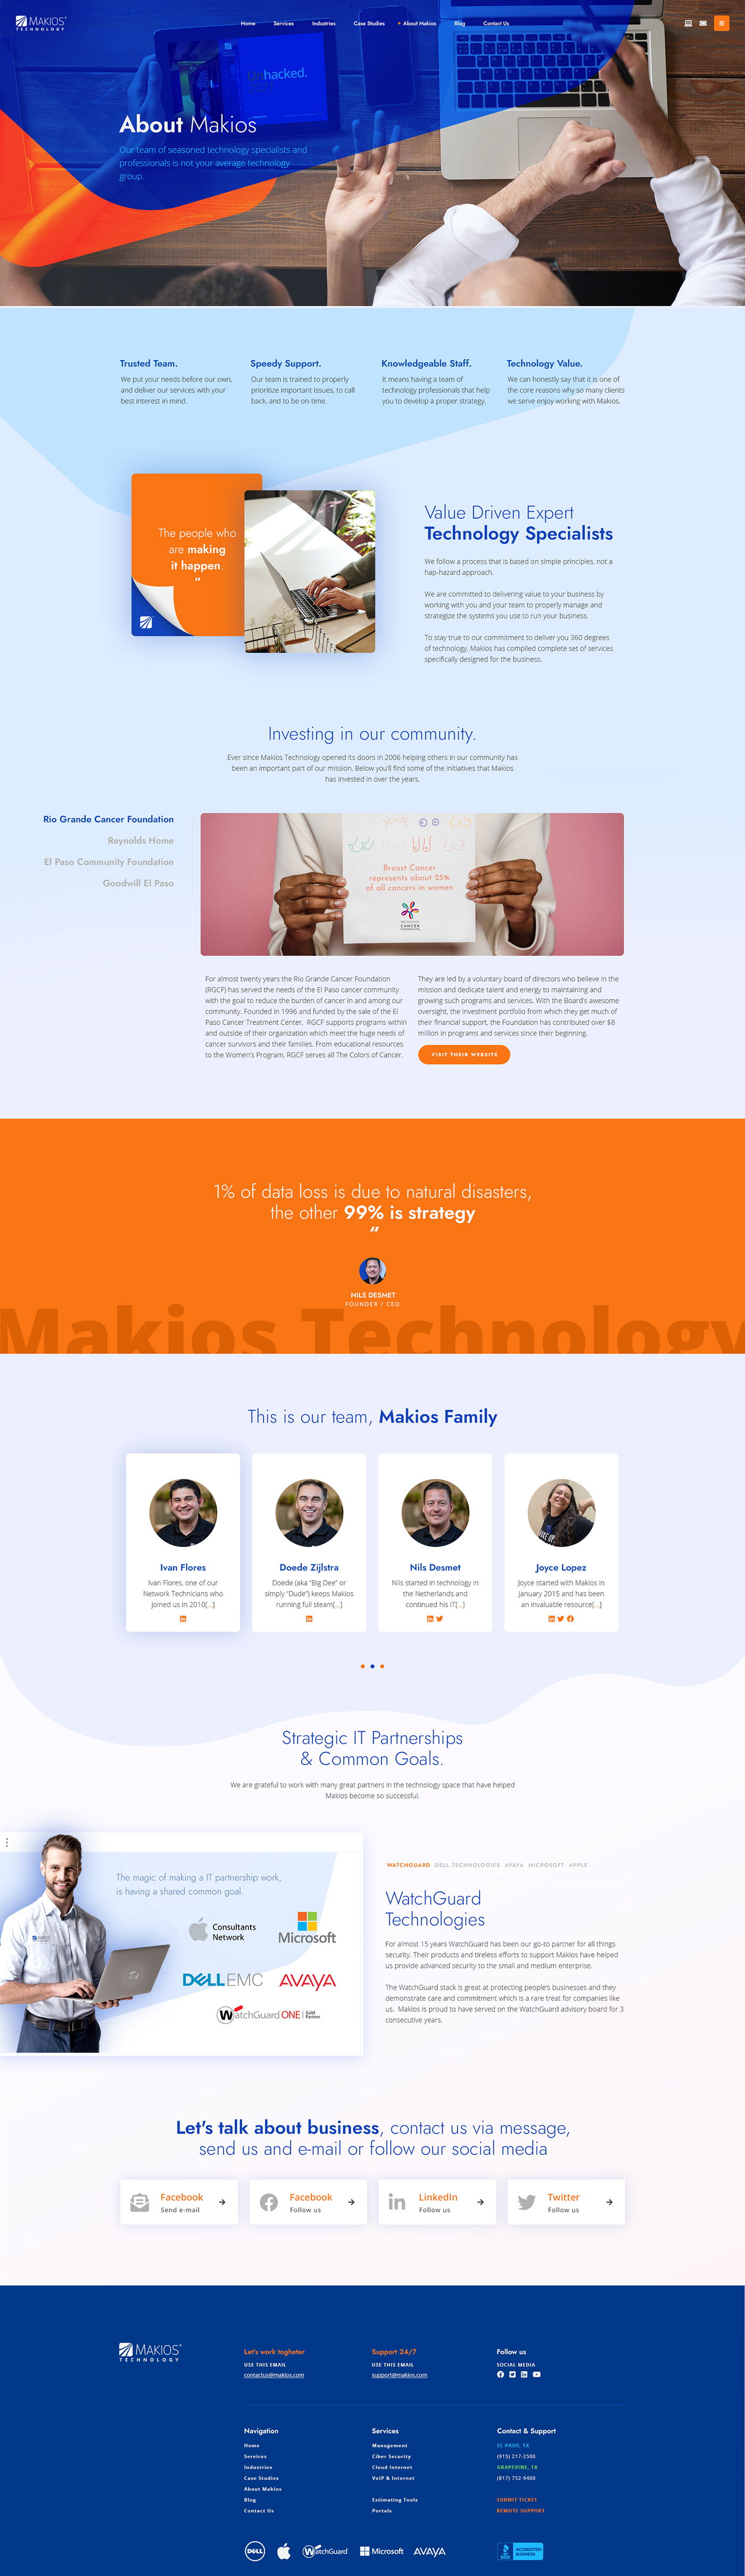 el paso IT makios redesign Responsive Website